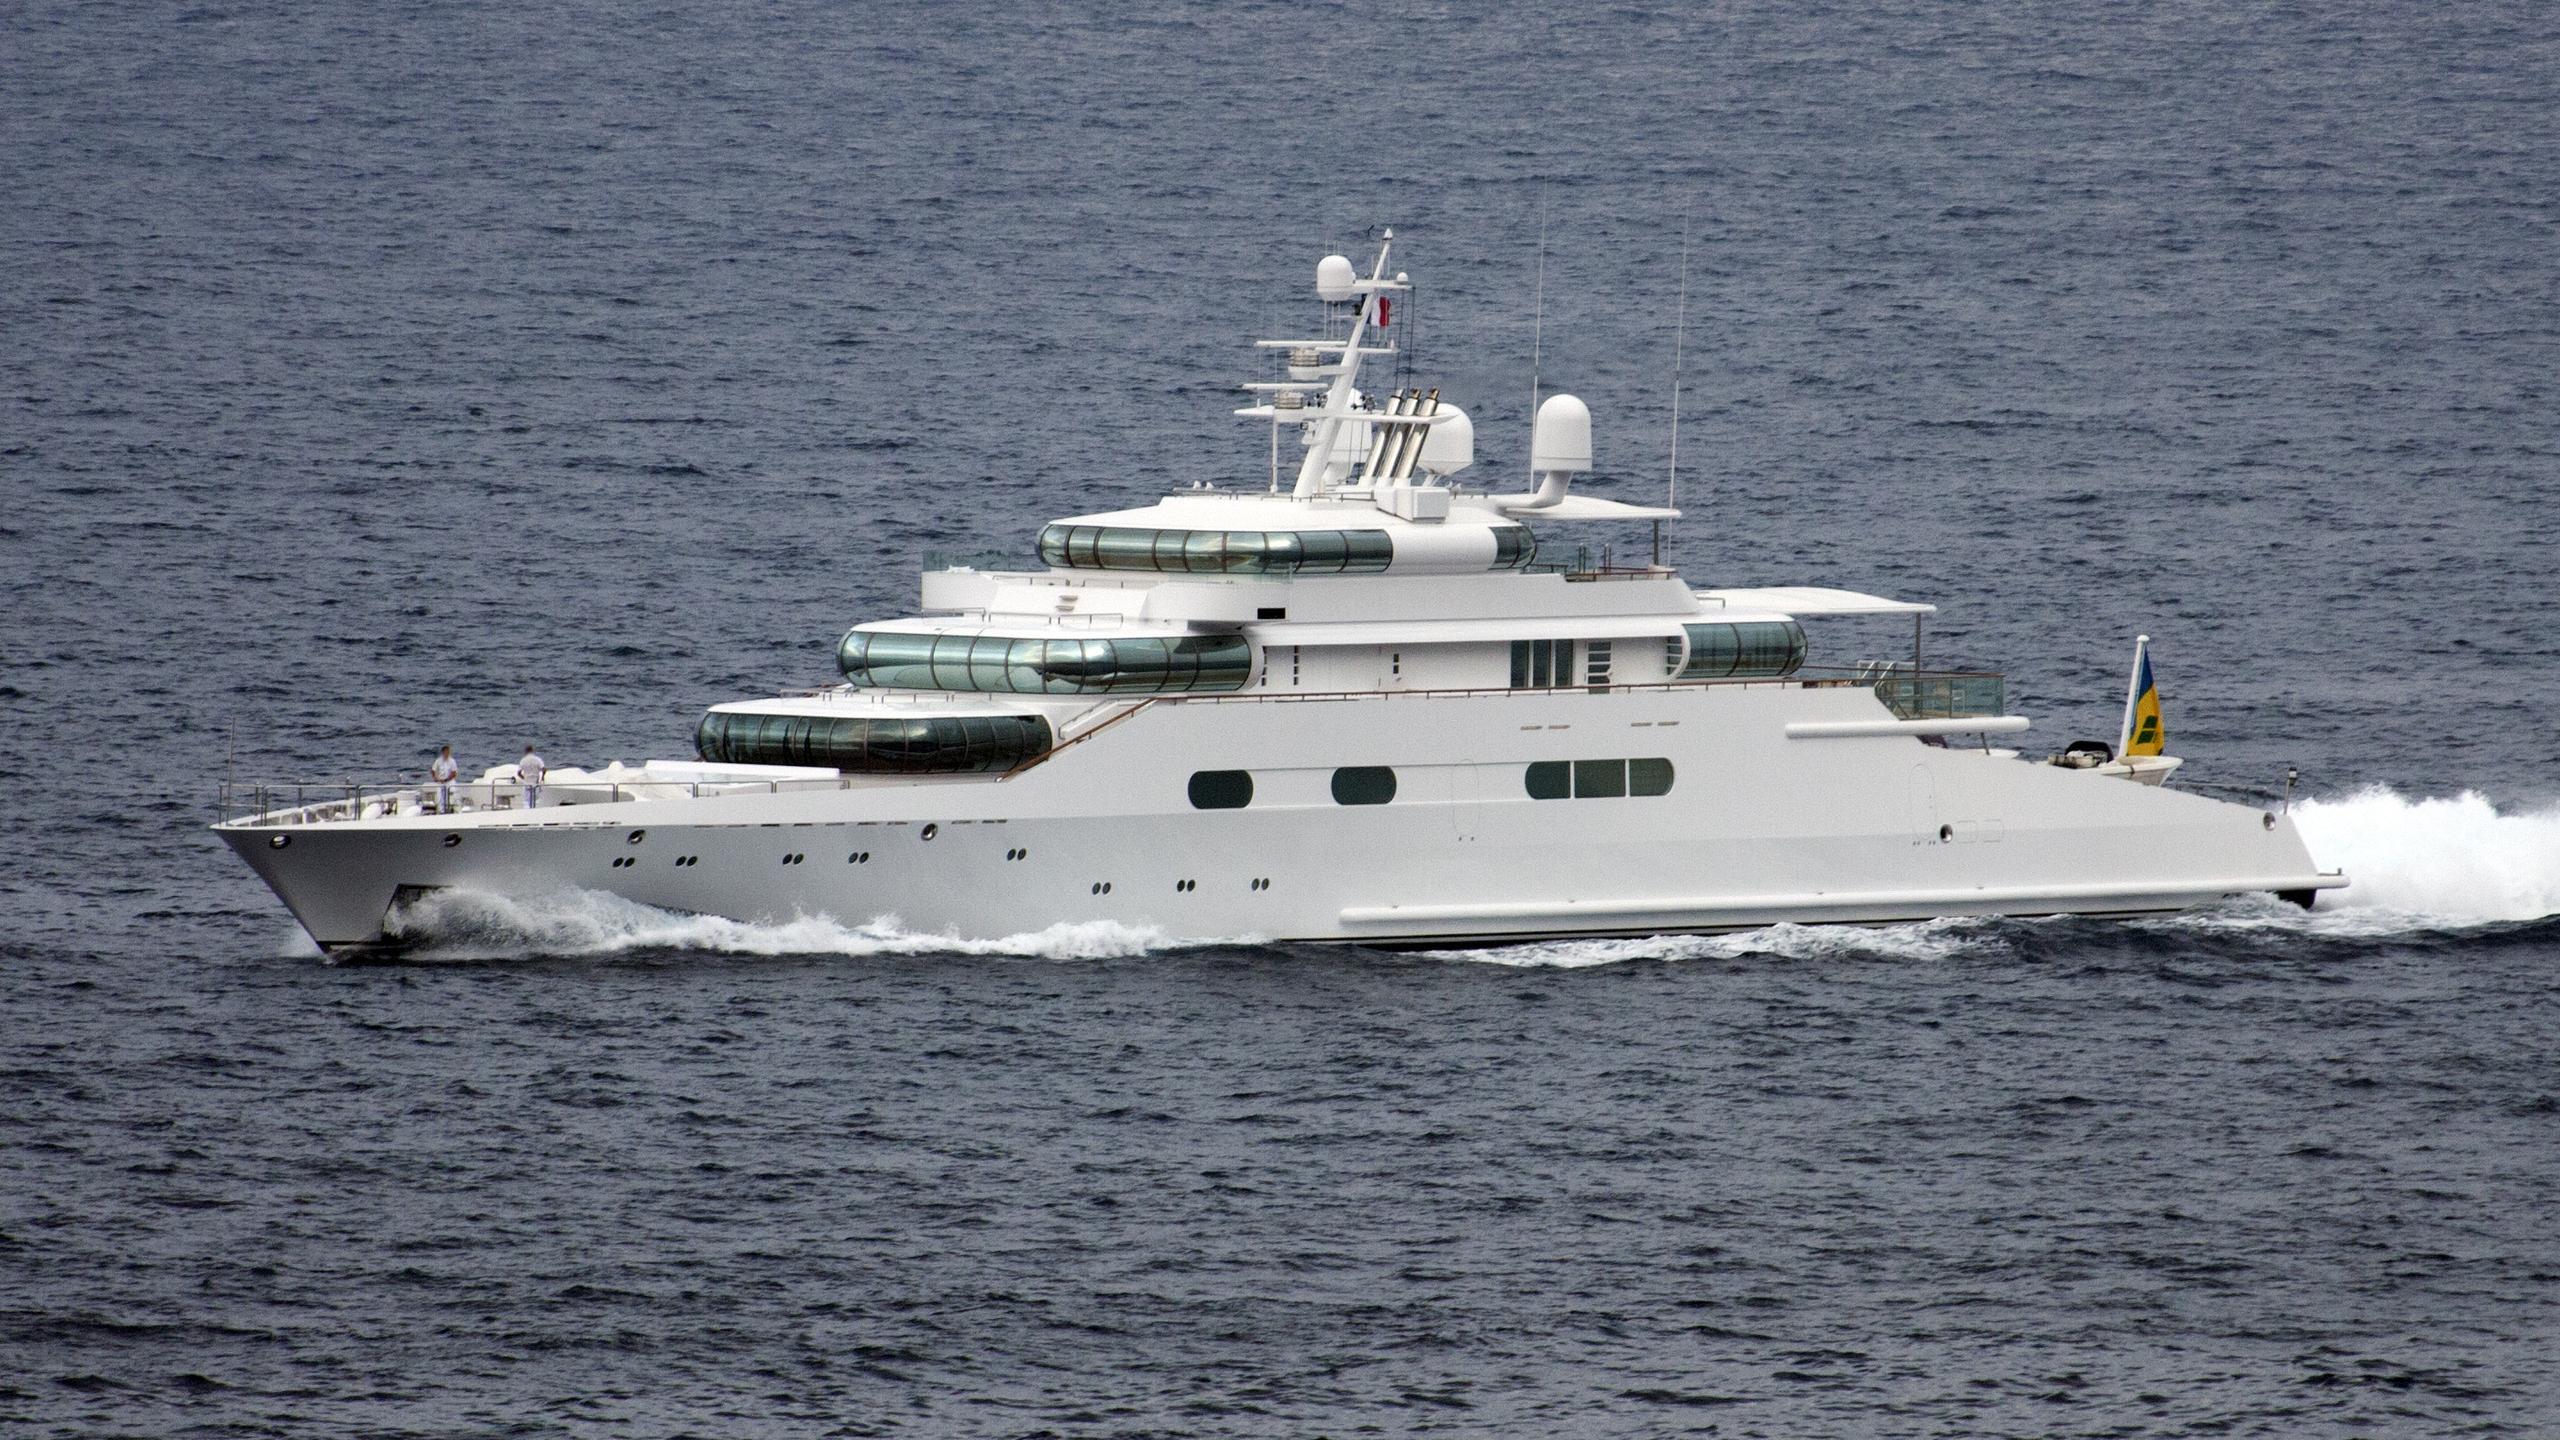 zeus-enigma-motor-yacht-blohm-voss-1991-75m-profile-cruising